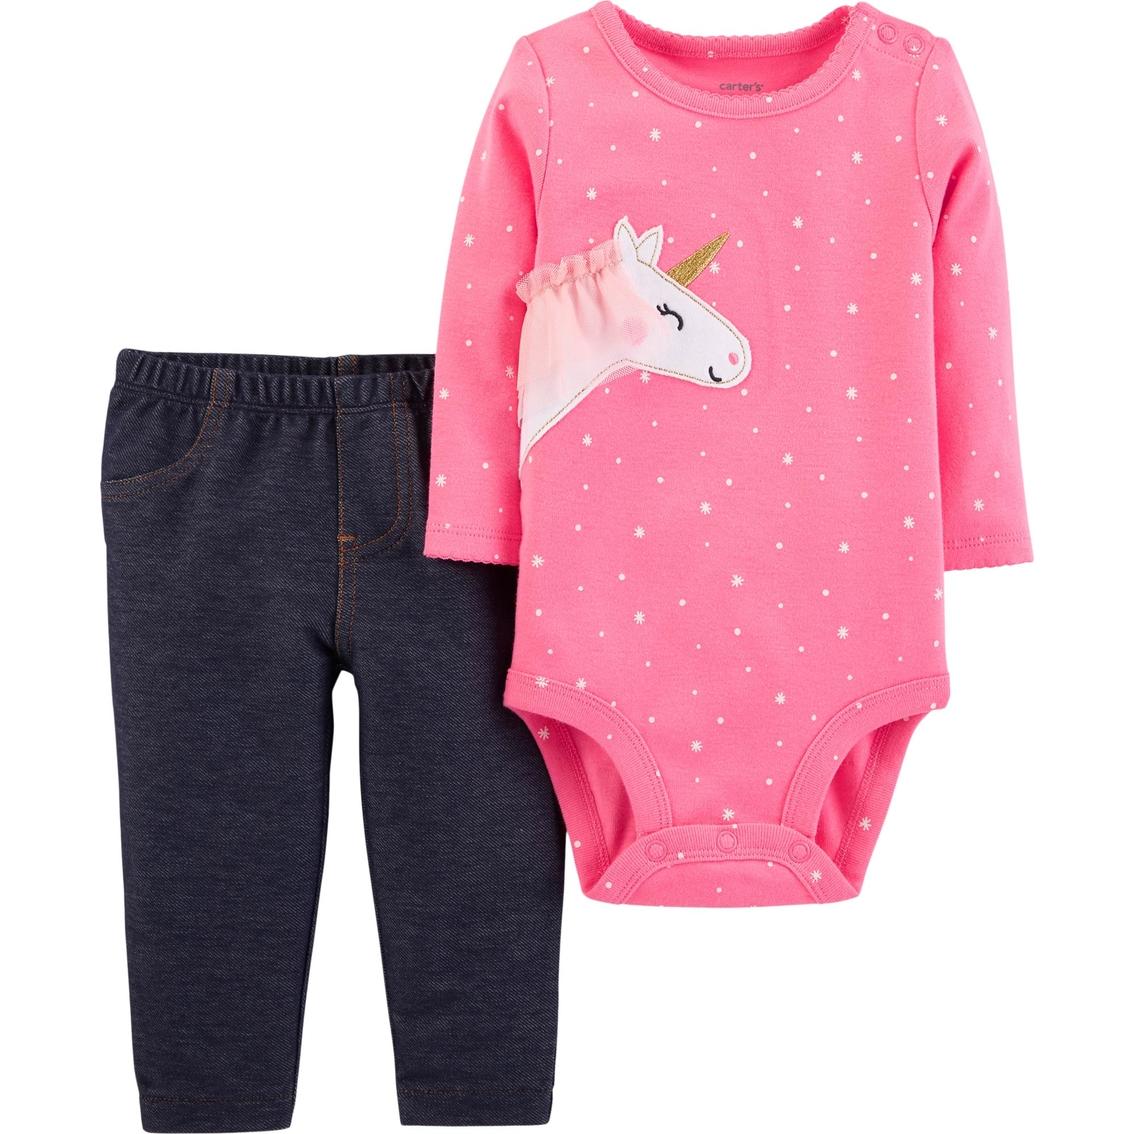 5f6715351 Carter s Infant Girls Unicorn Bodysuit 2 Pc. Pants Set